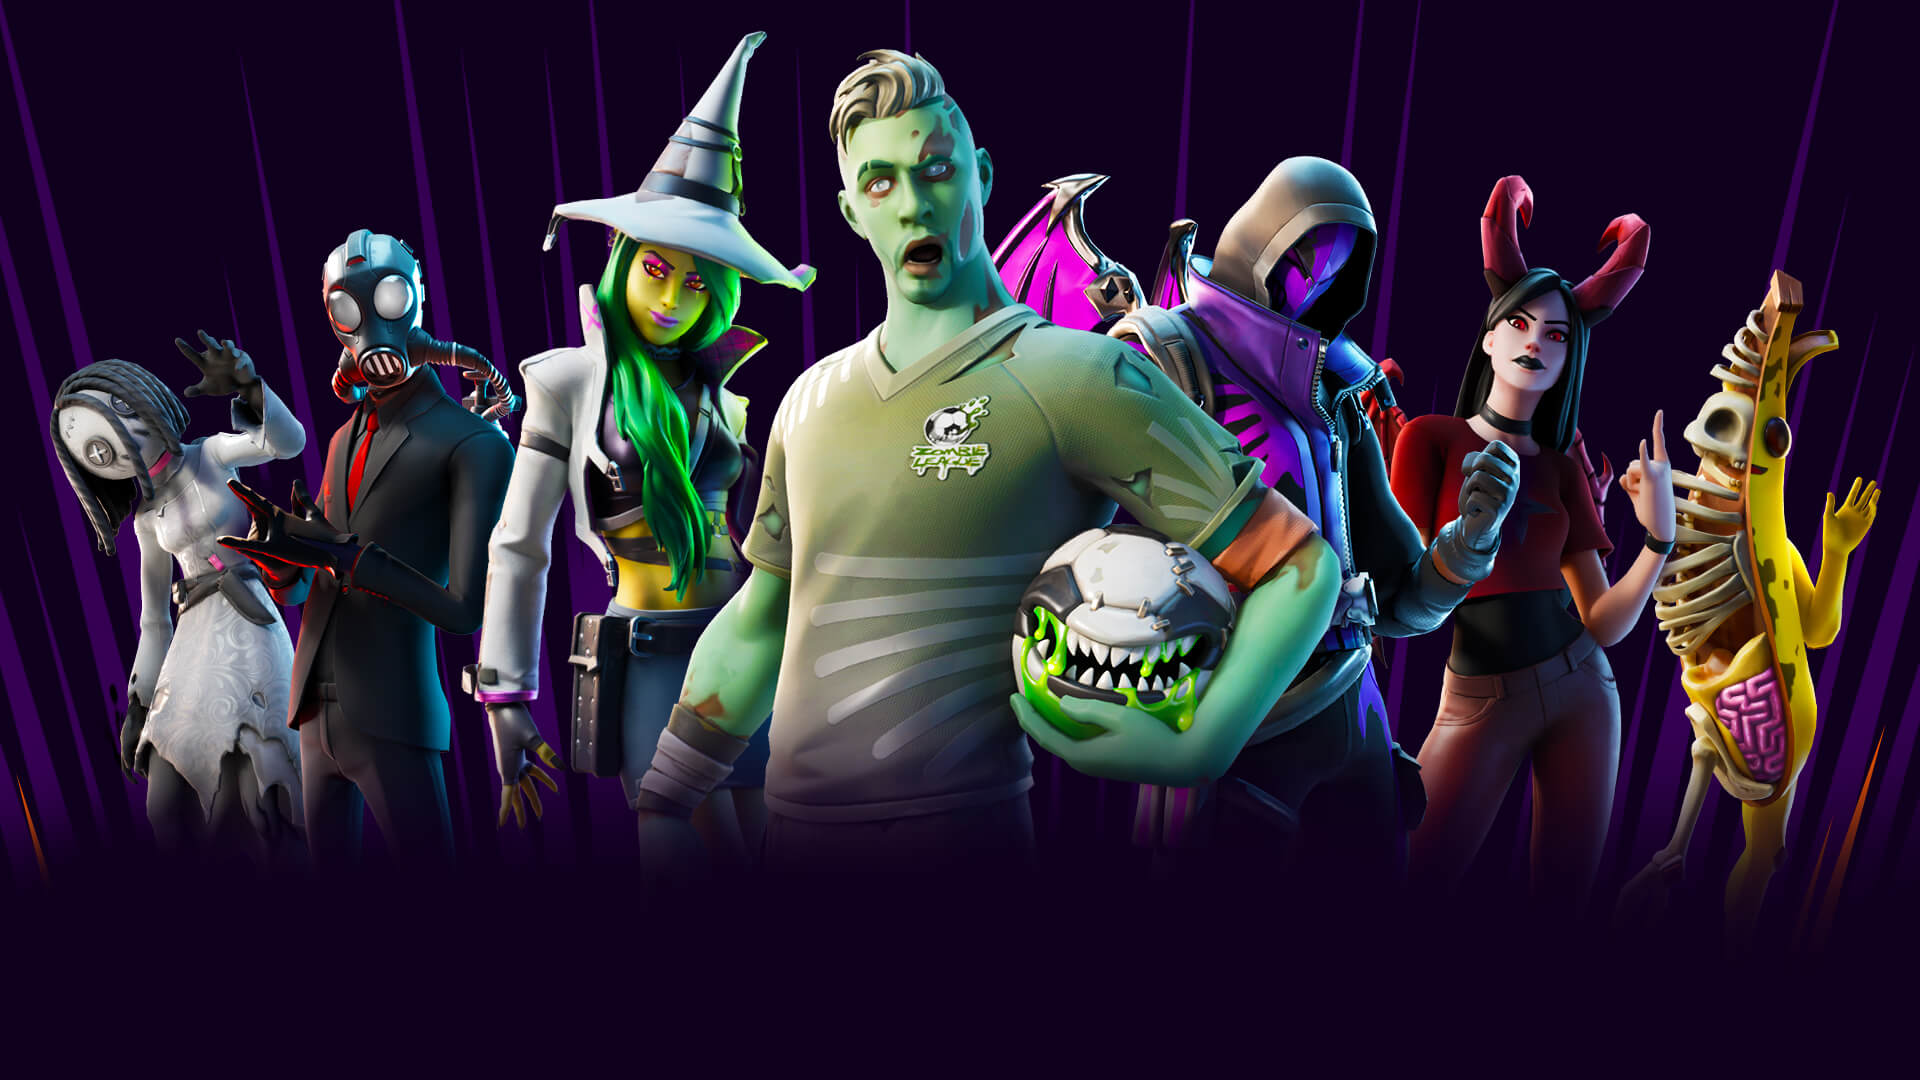 Fortnite Halloween Skins 2020 All Years Full List Pro Game Guides